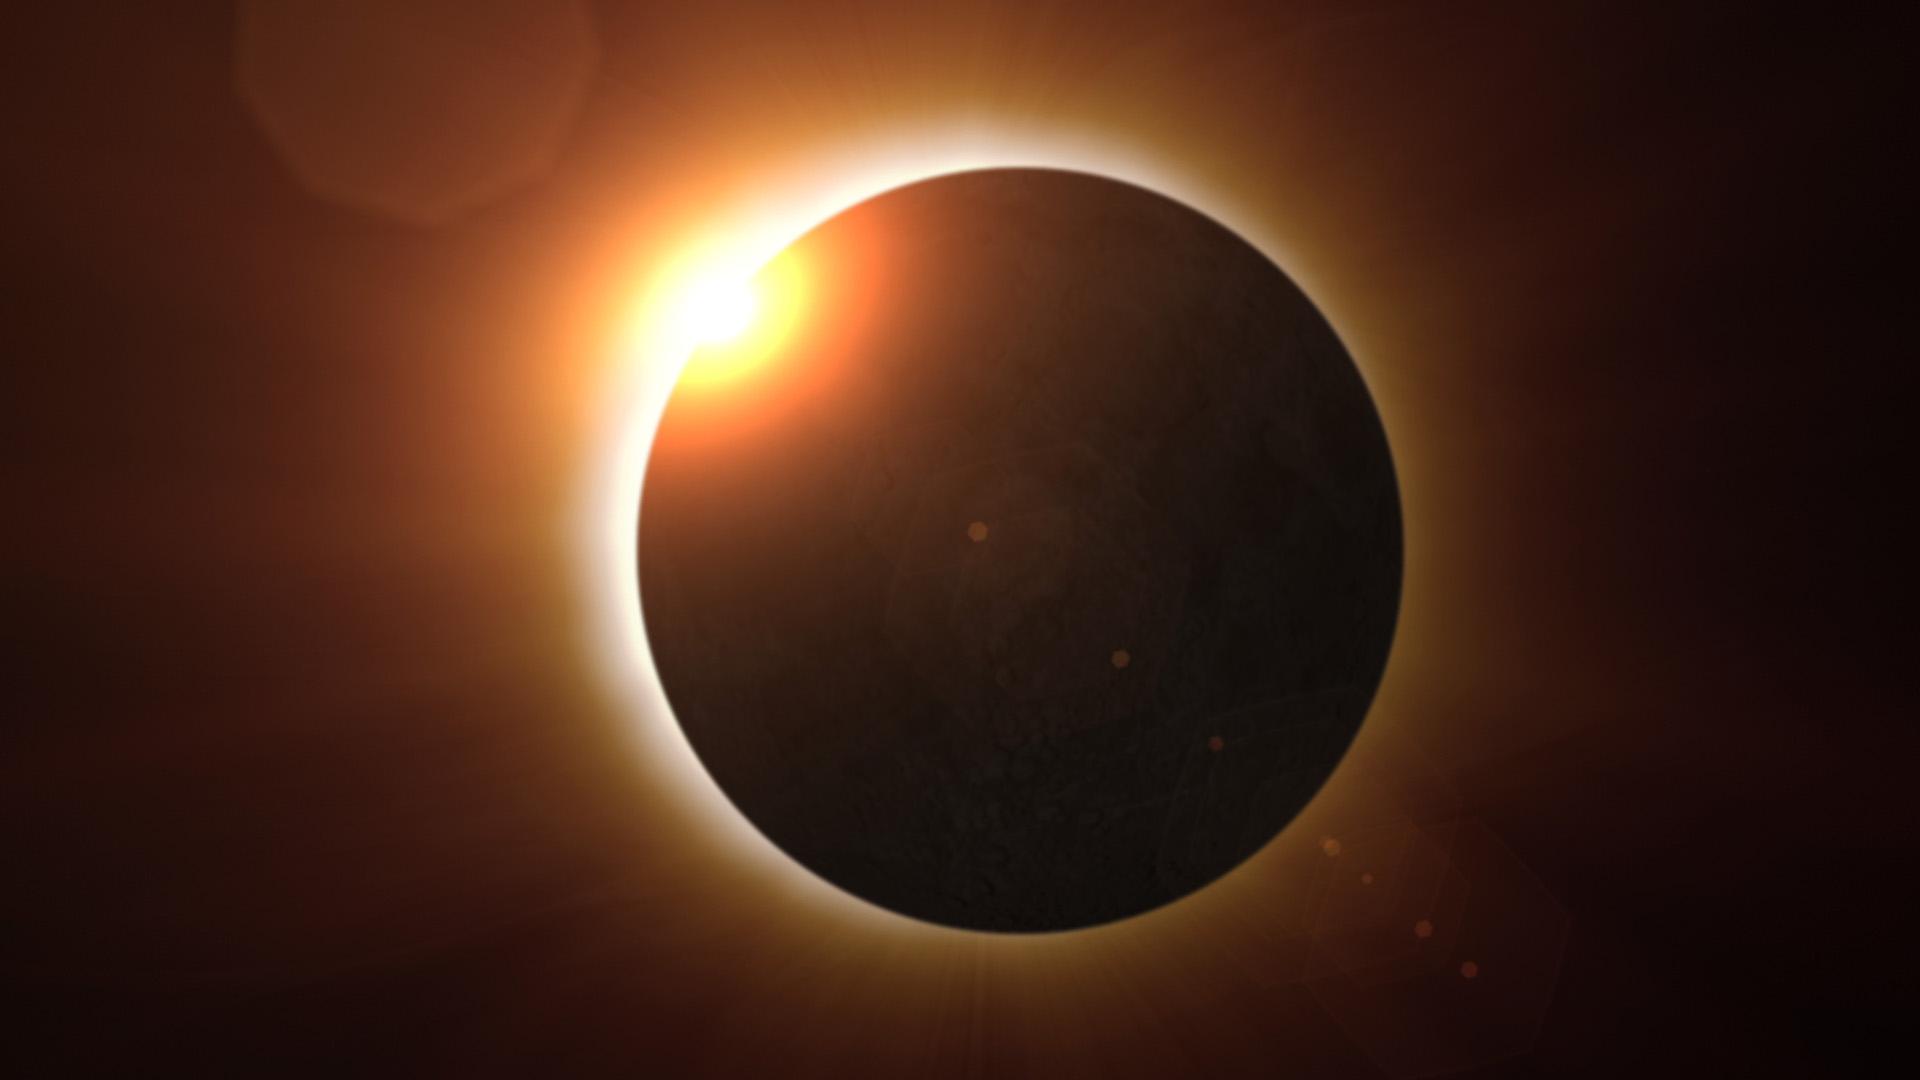 NASA Announces Television Coverage For Aug 21 Solar